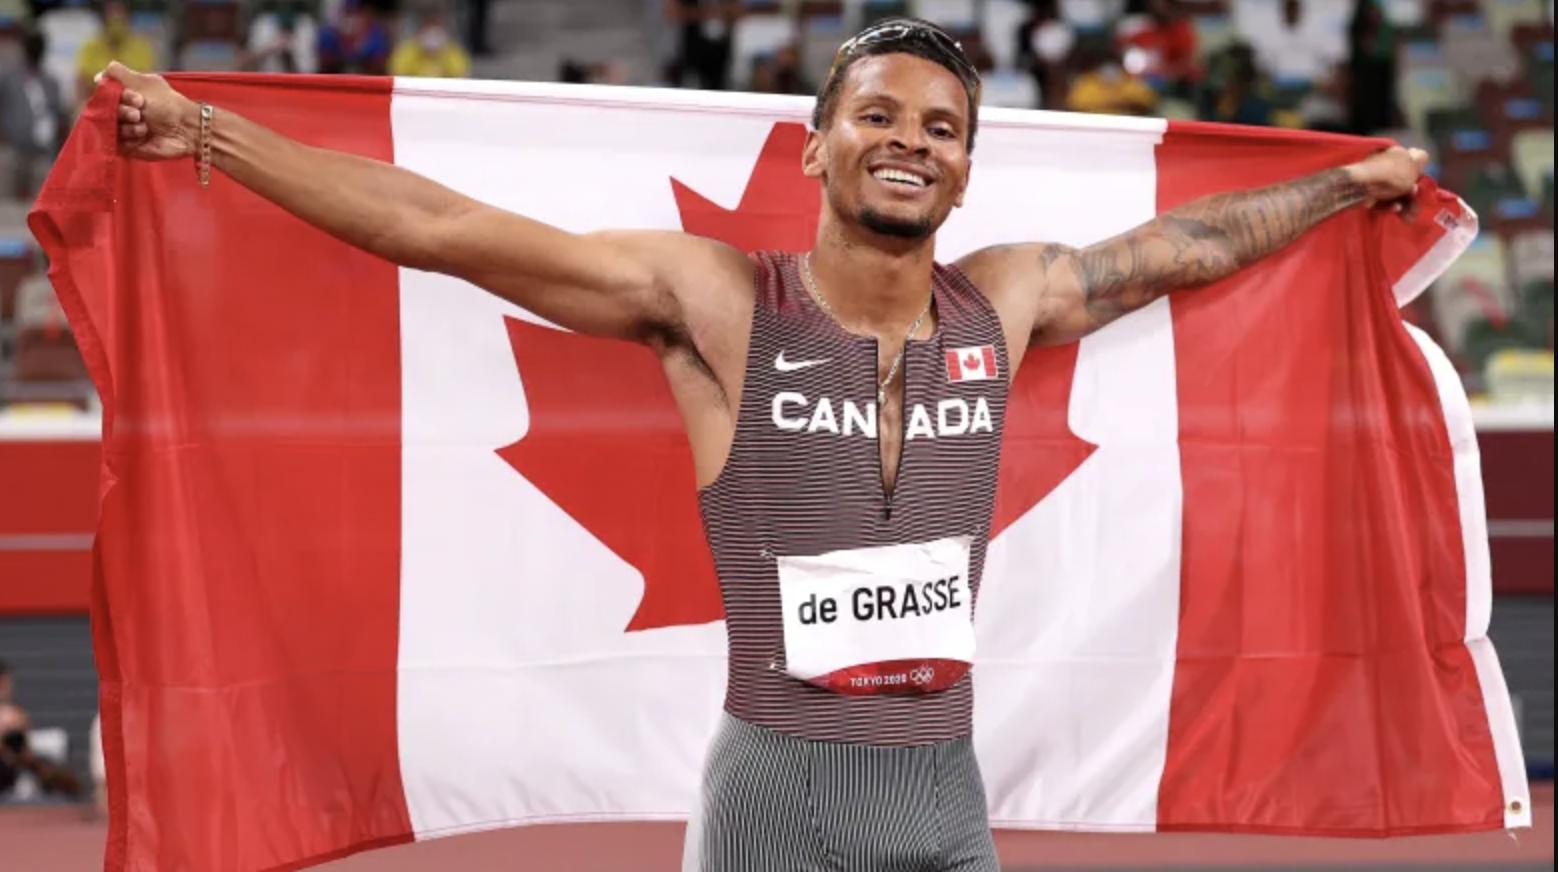 Andre de Grasse Wins Gold in 200m 🥇